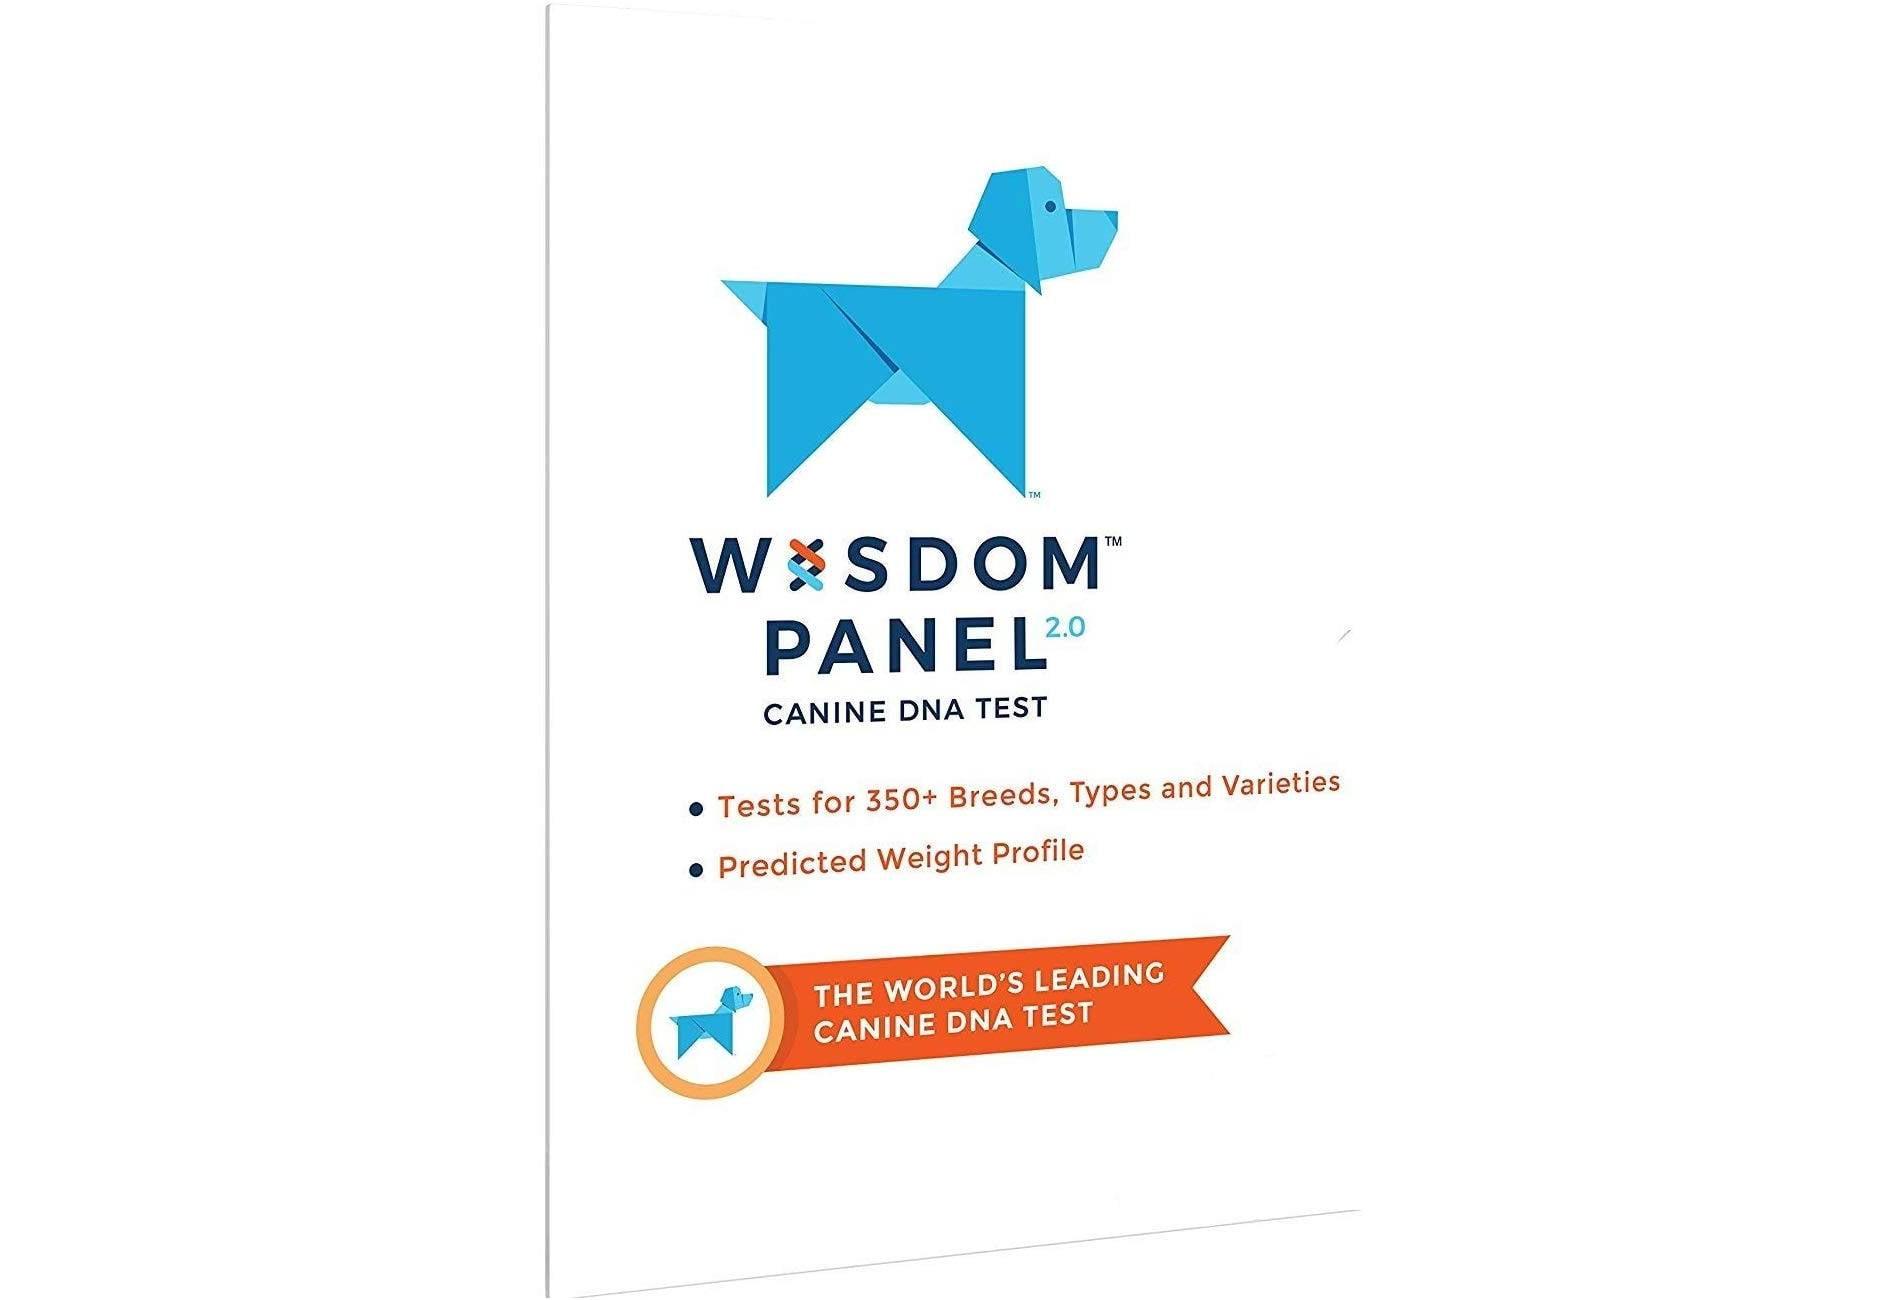 Wisdom Panel 2.0